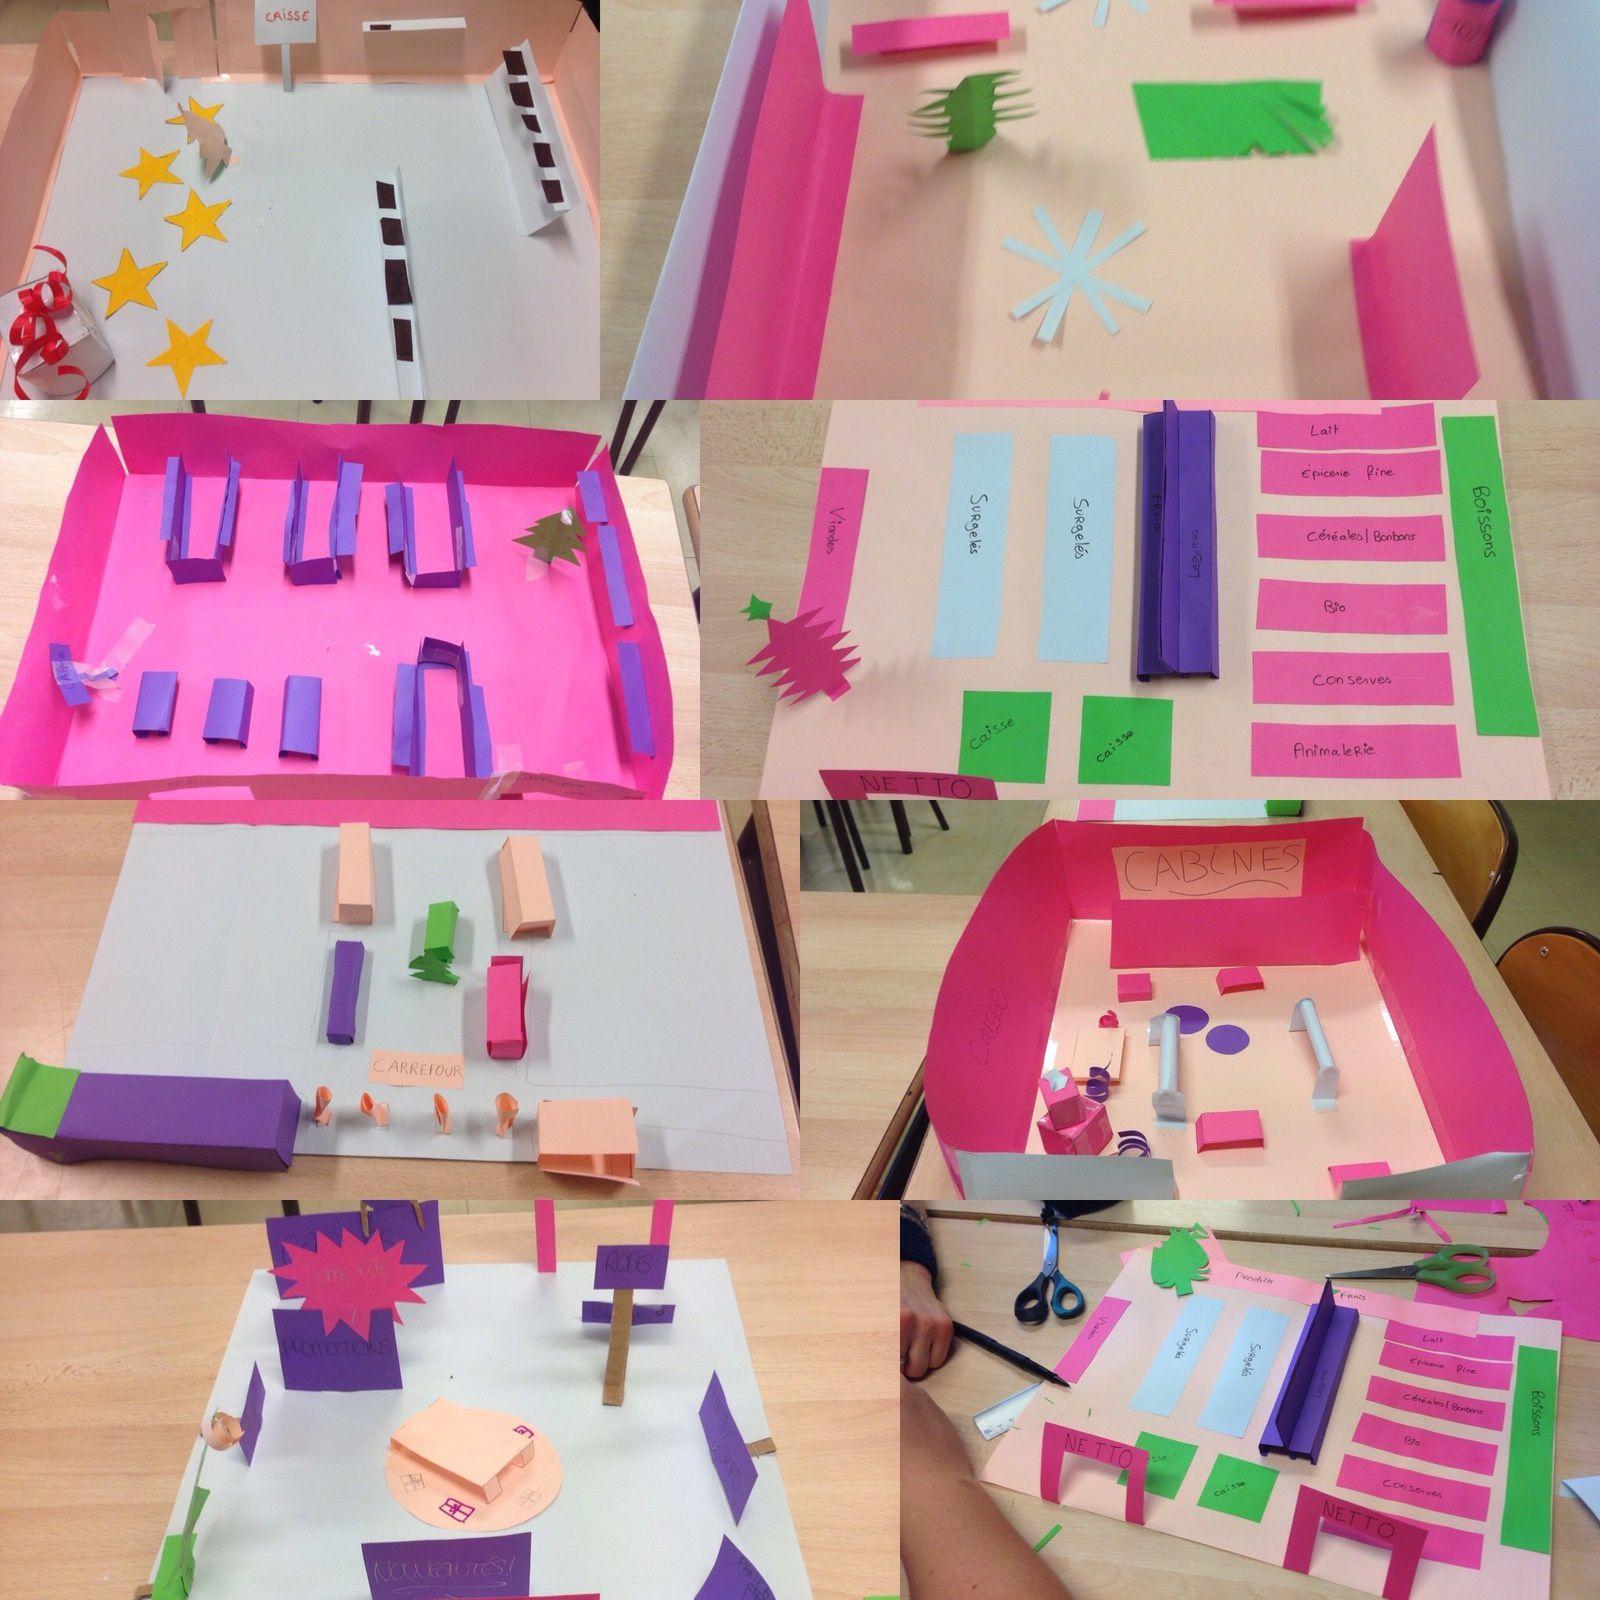 Atelier maquettes - 2